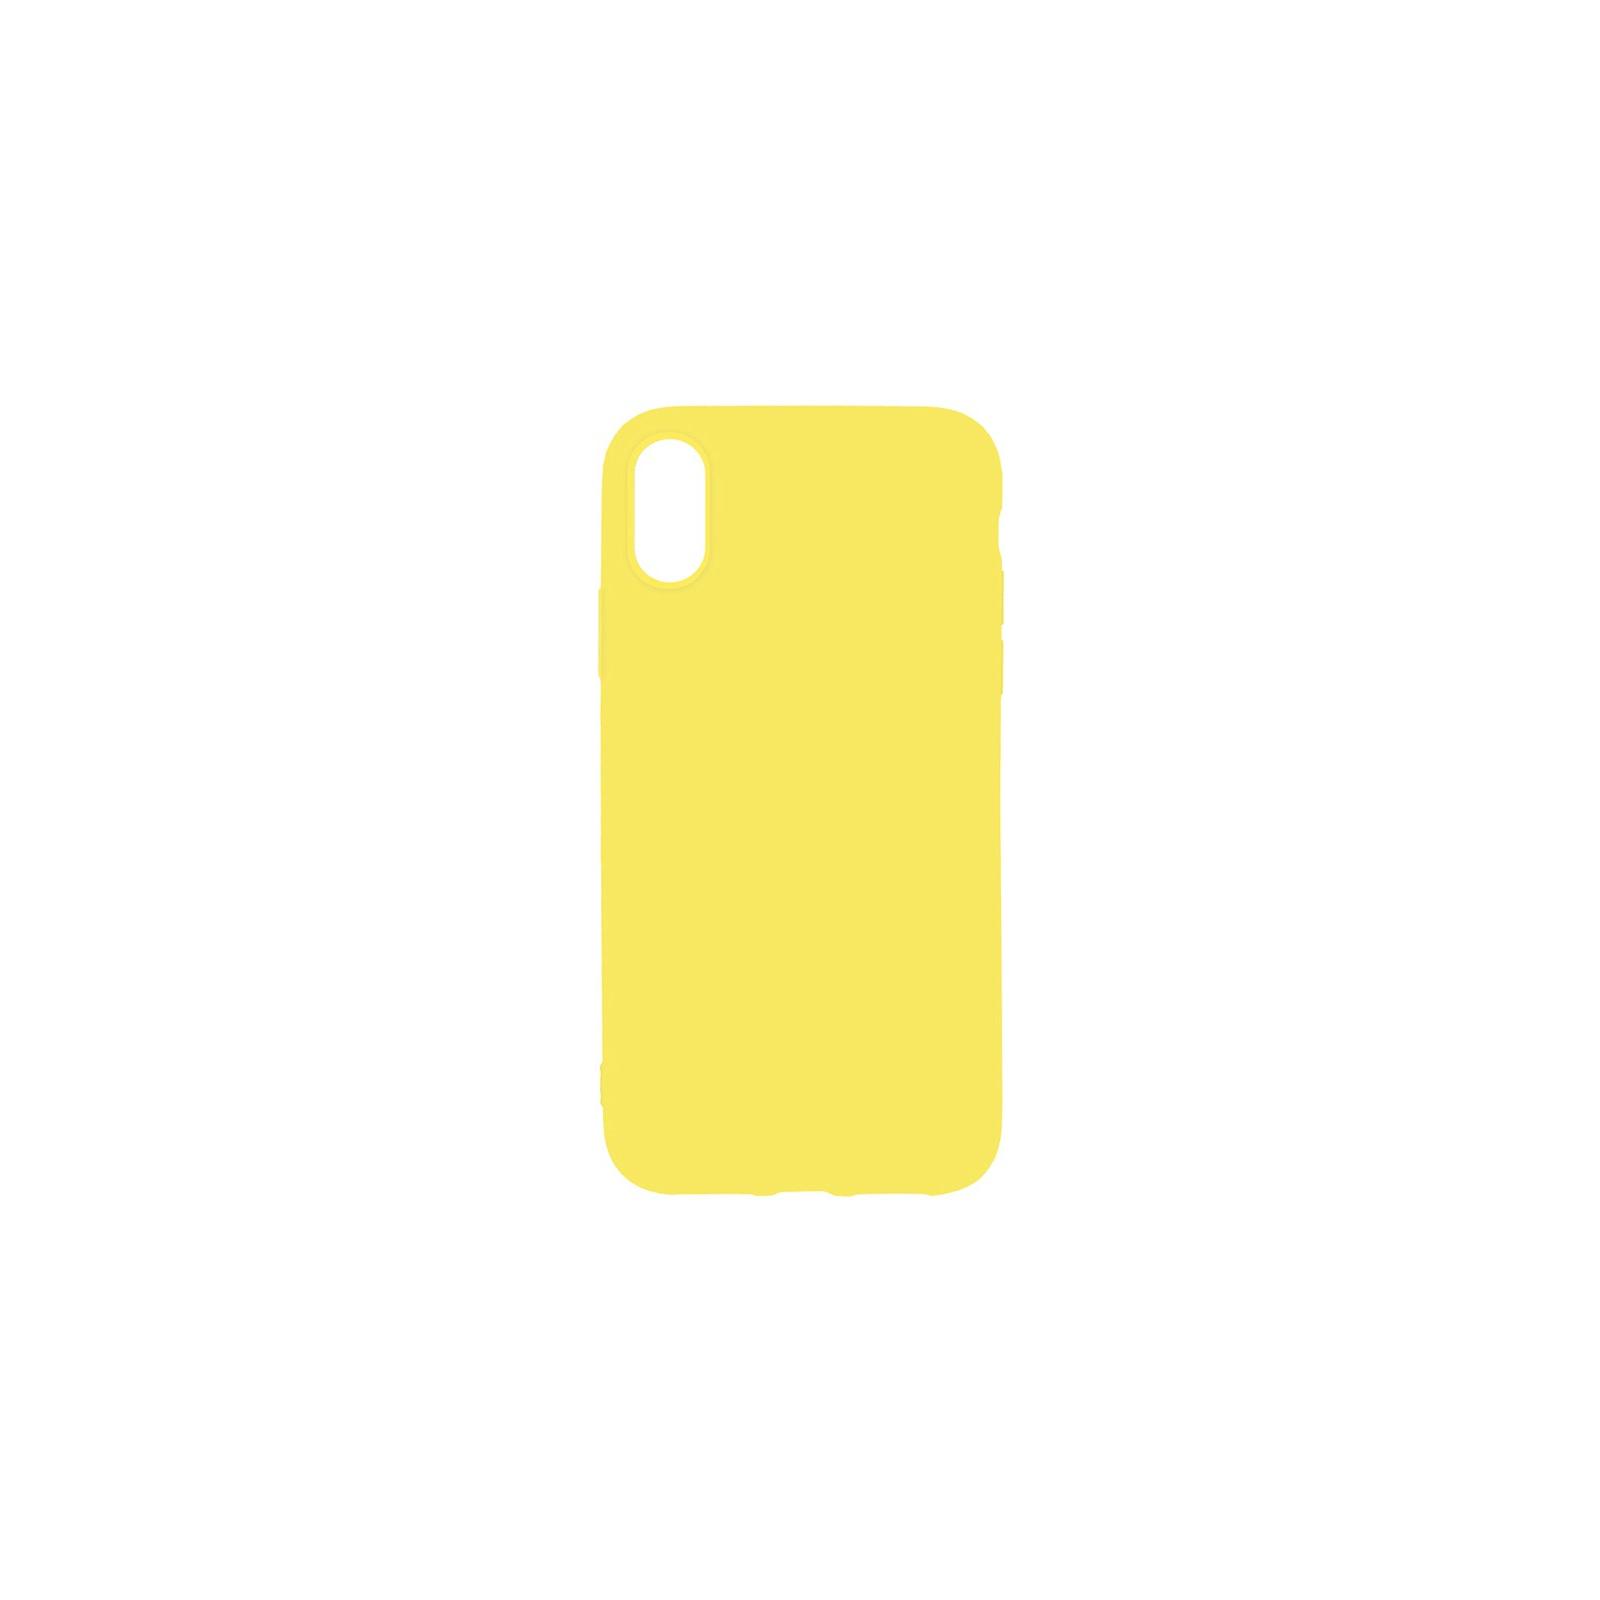 Чехол для моб. телефона Toto 1mm Matt TPU Case Apple iPhone X/XS Yellow (F_93844)